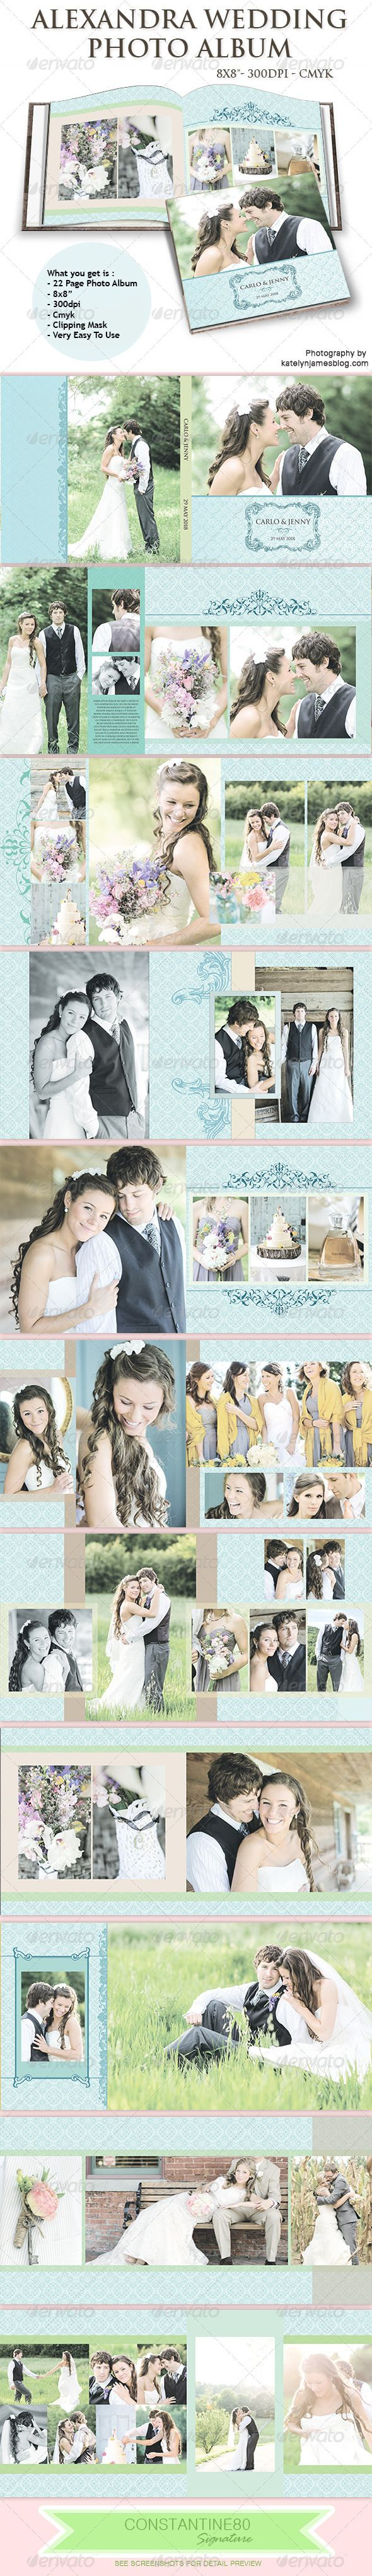 Alexandra Wedding Photo Album